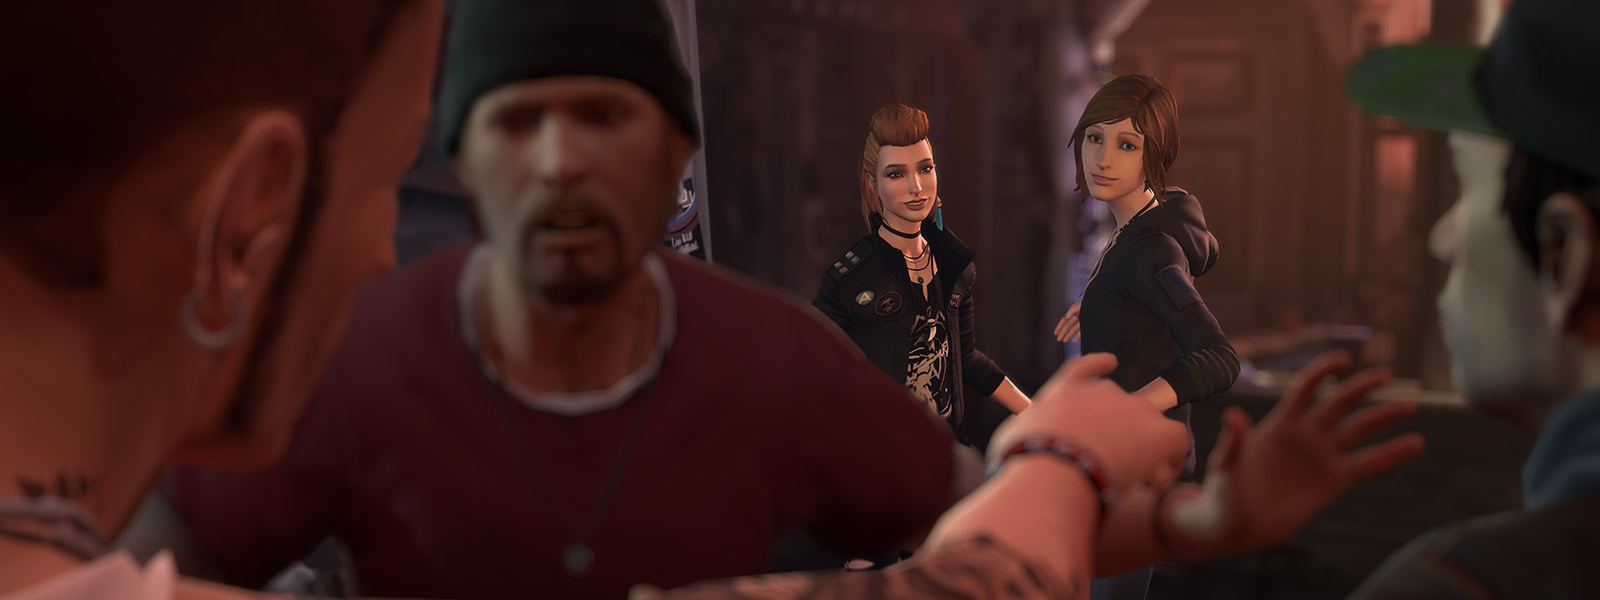 Chloe 和 Rachel,以及前景擋住人群的保全人員